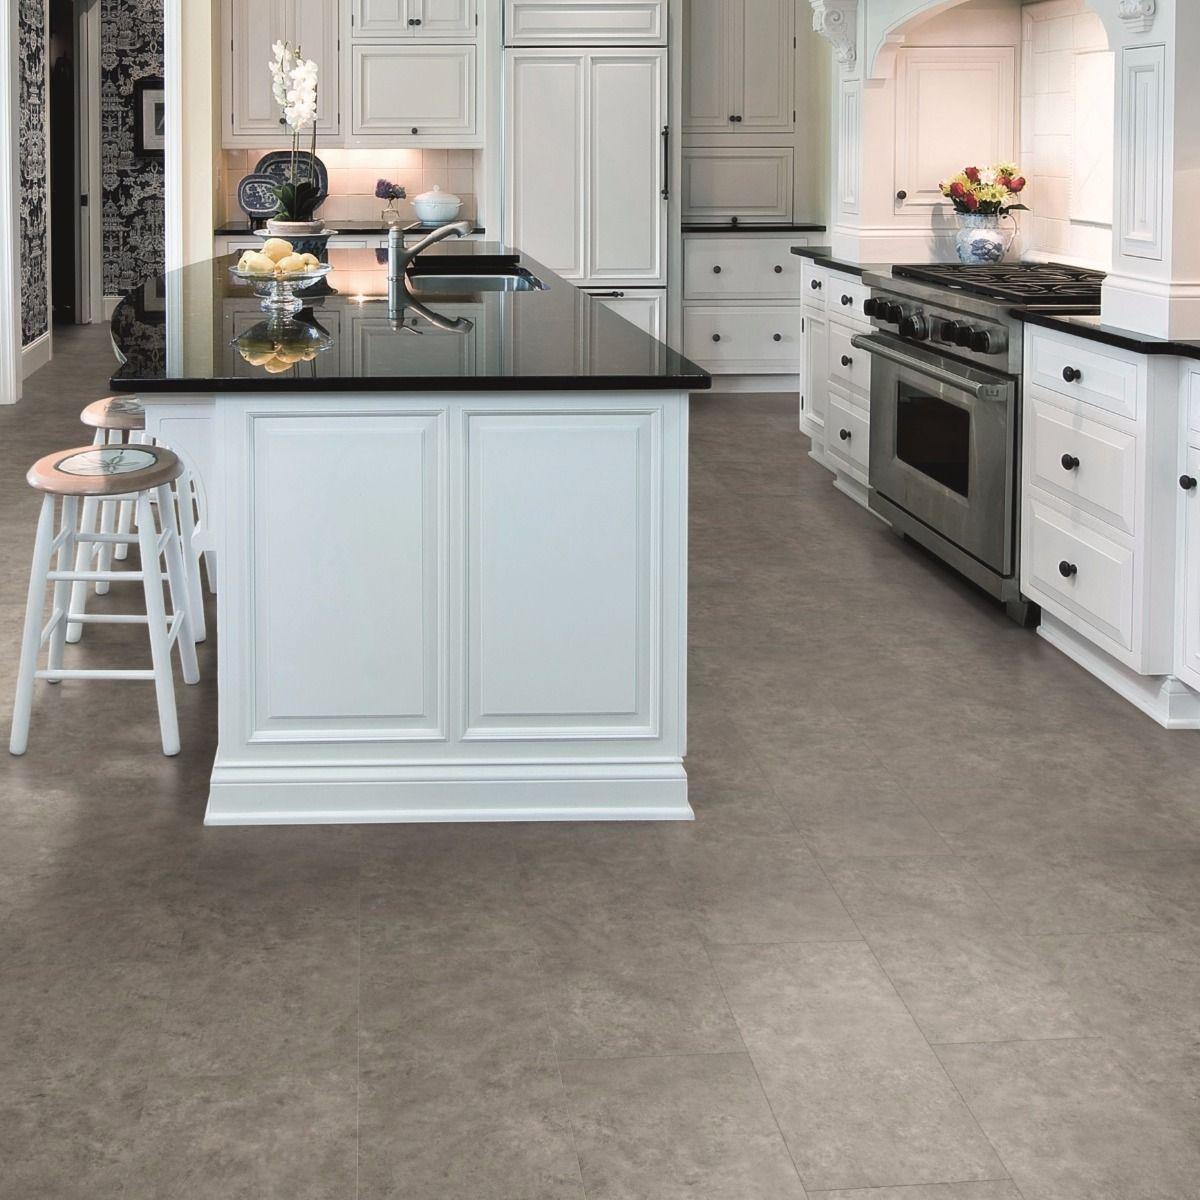 Luxury Vinyl Tile Flooring - Wilplas